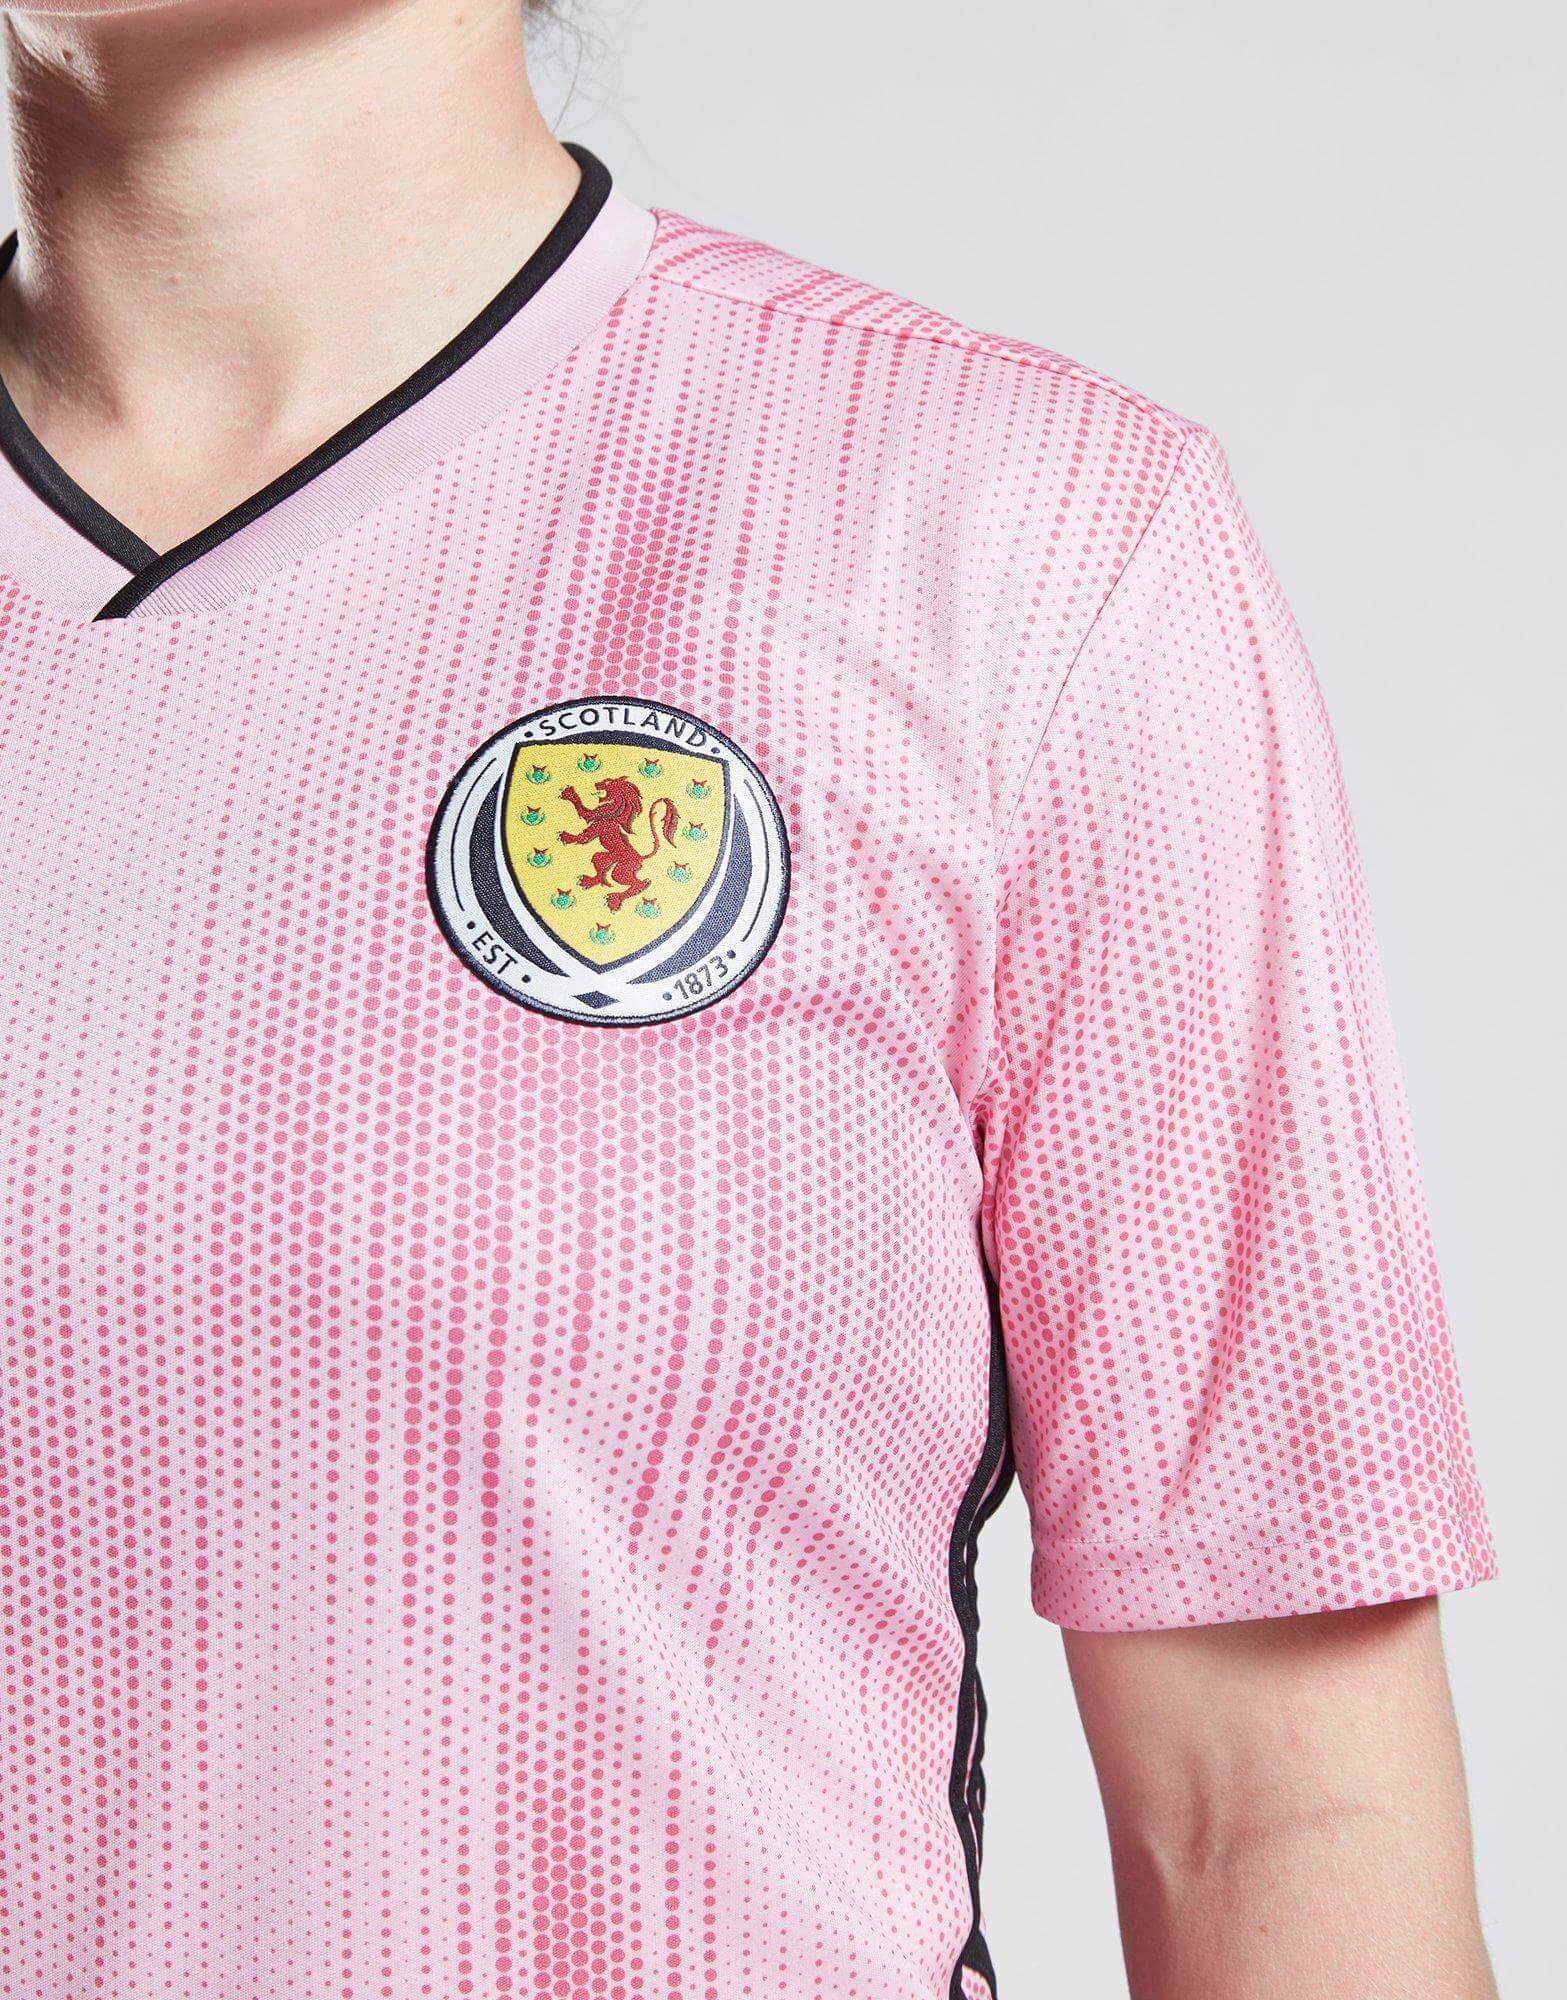 7d84874cdbb ... Click to enlarge image  scotland 2019 womens world cup adidas away kit c.jpg ...